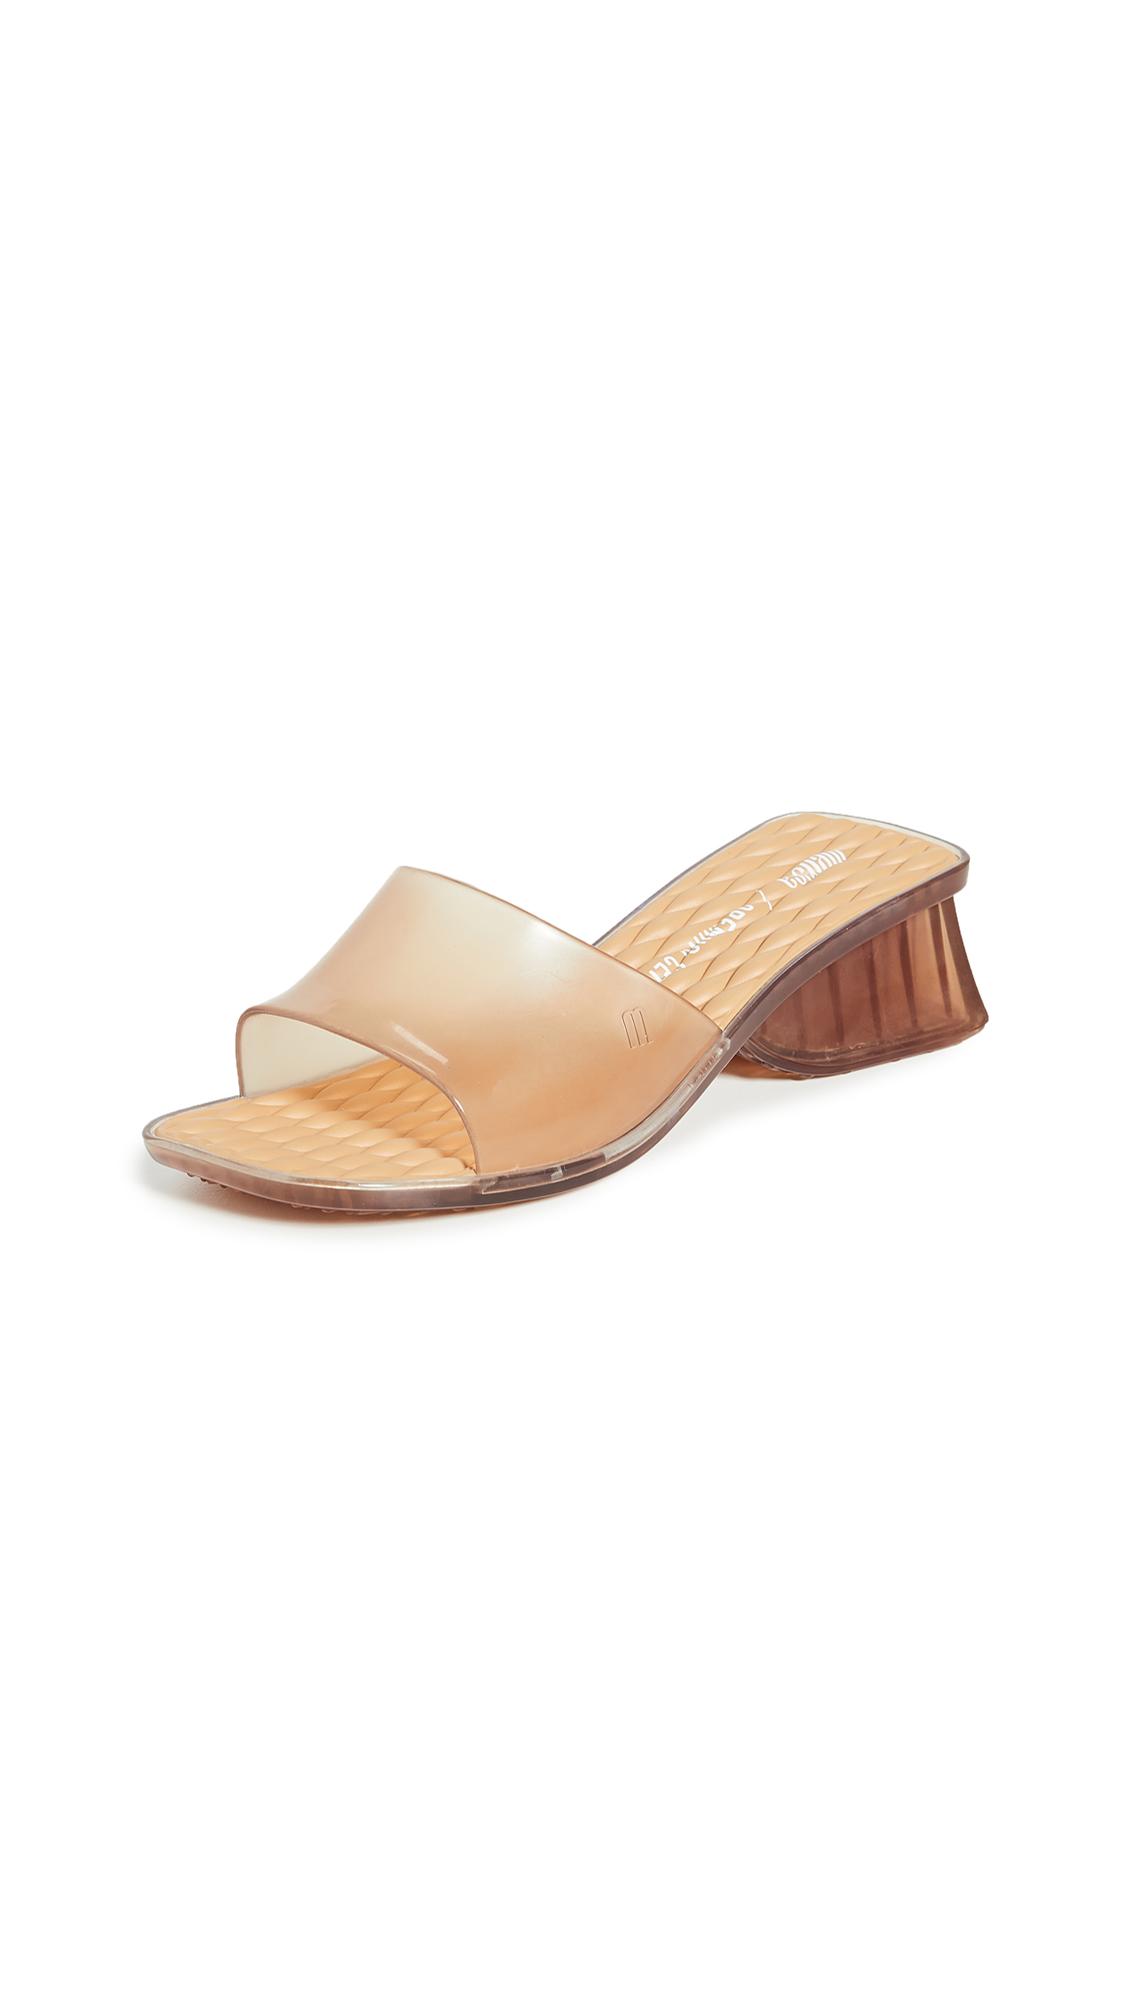 Melissa X Opening Ceremony Ladii Sandals - 30% Off Sale